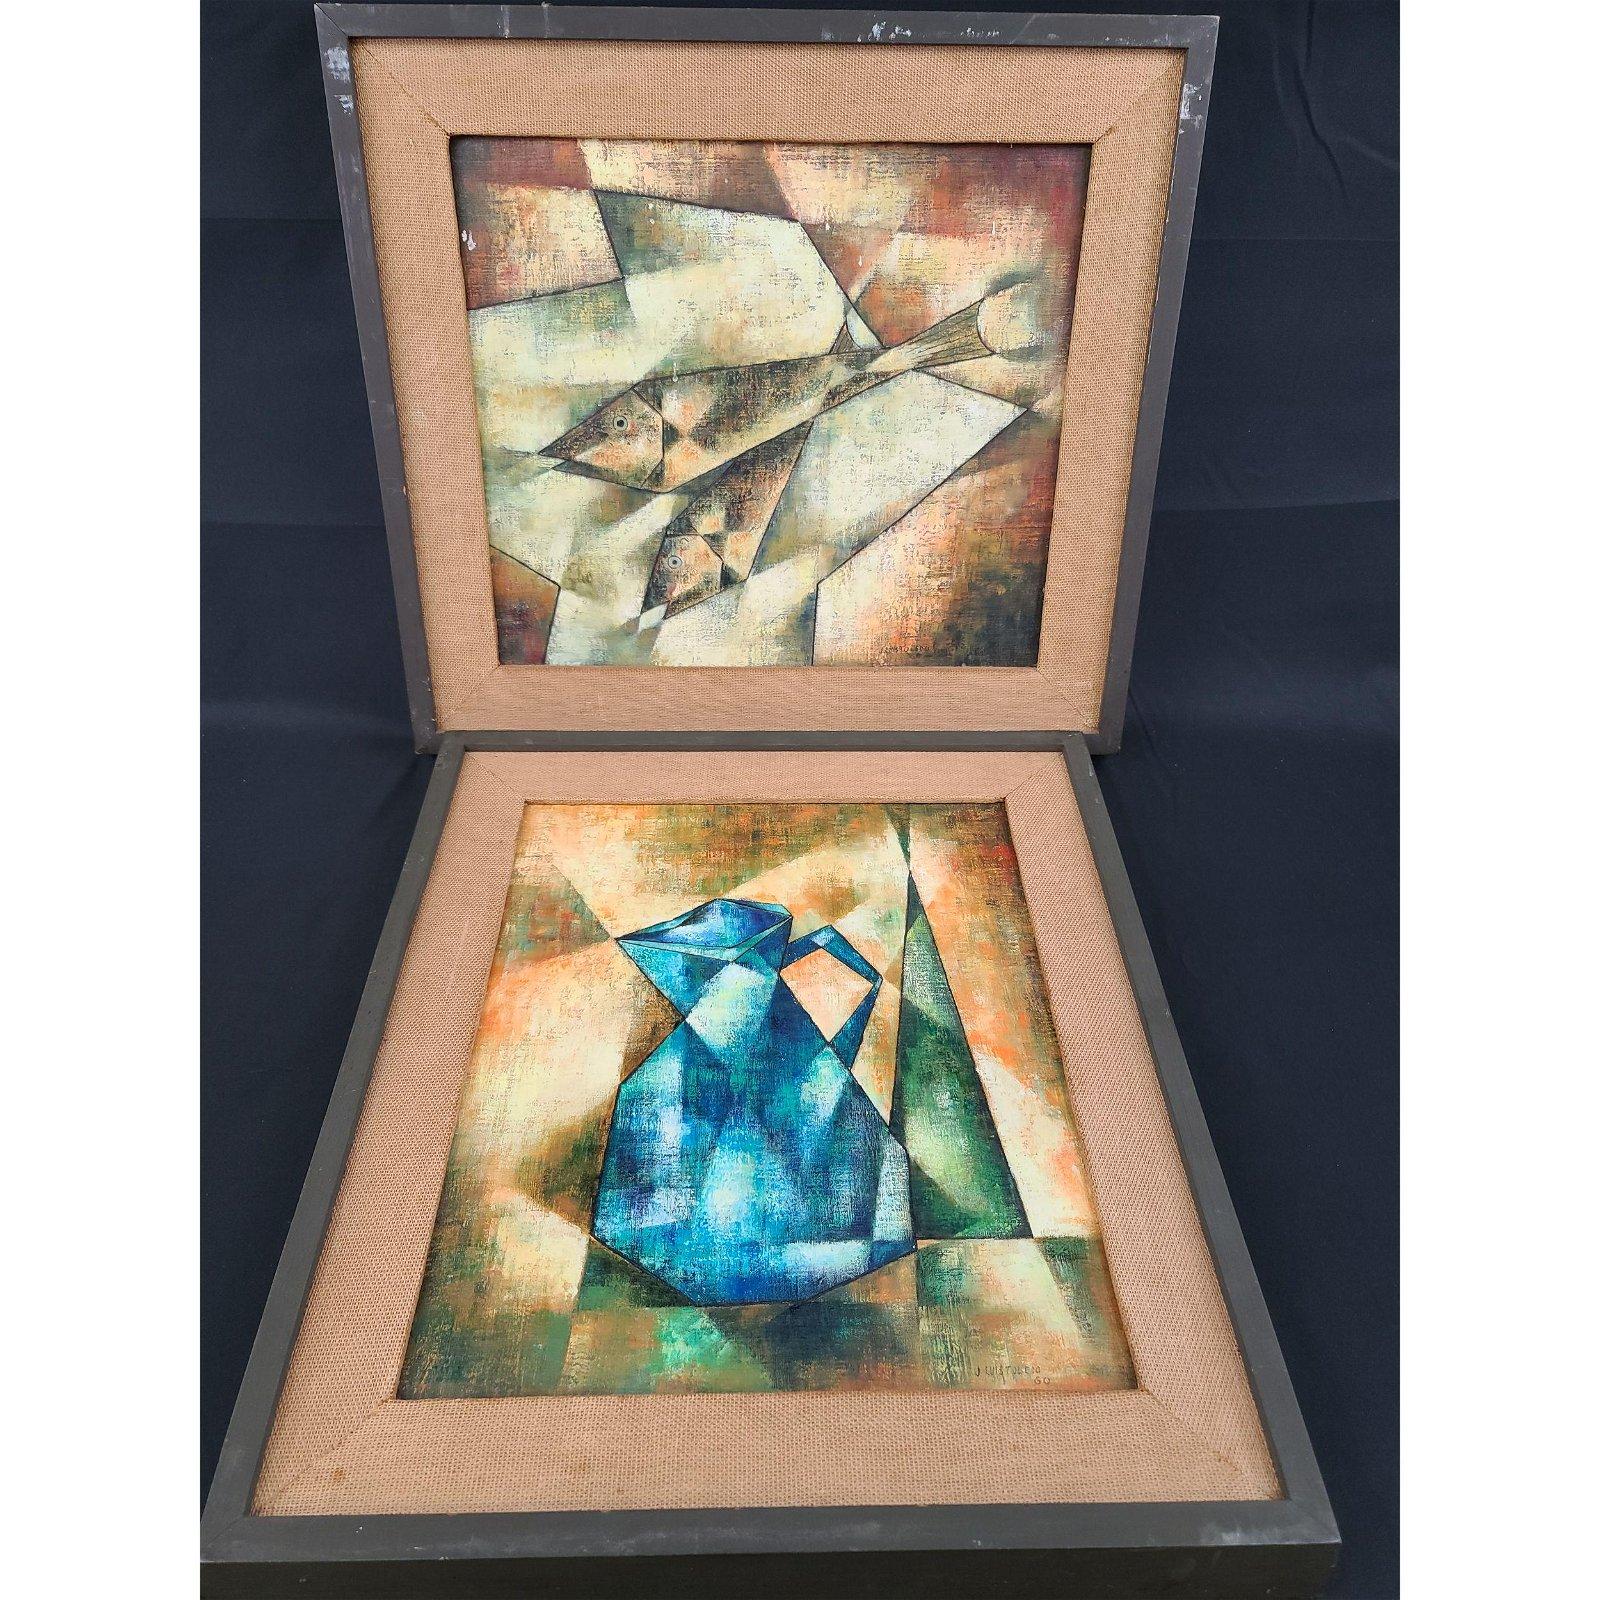 Mid Century Cubist Painting J Luis Toledo 1929-07